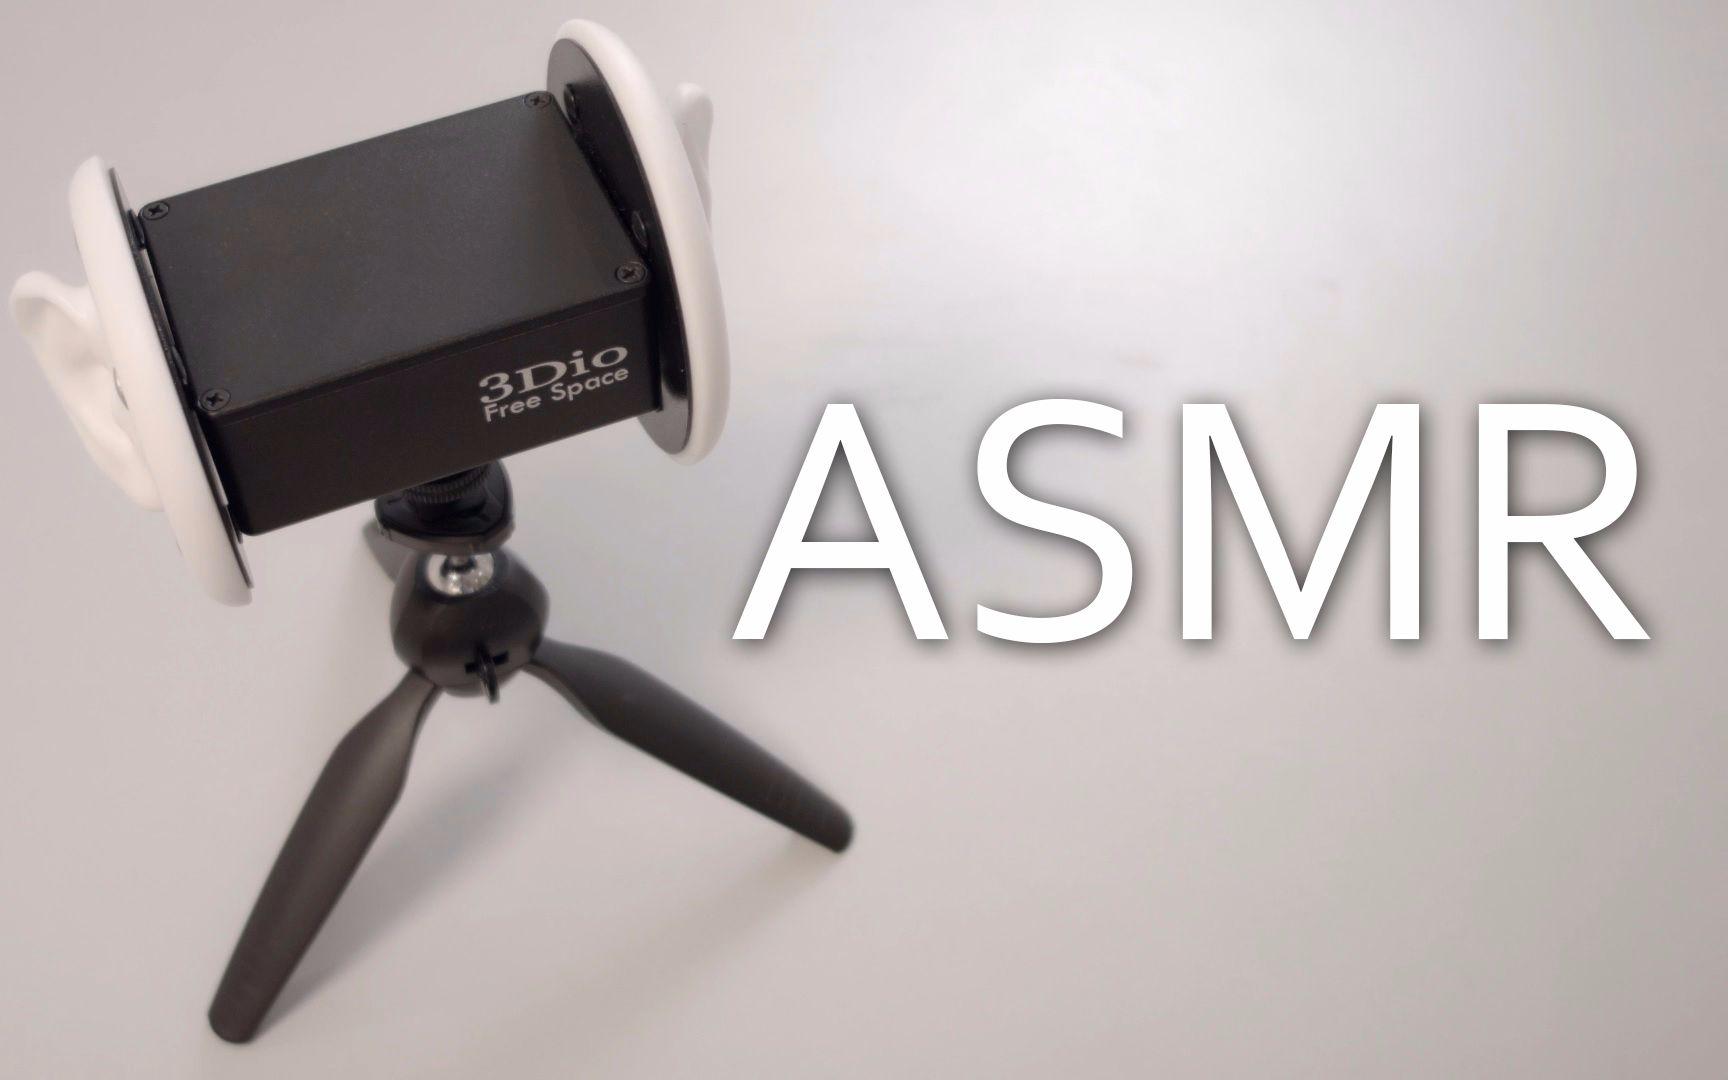 【b站】【LKs】深度科普ASMR与人头录音 - ACG17.COM